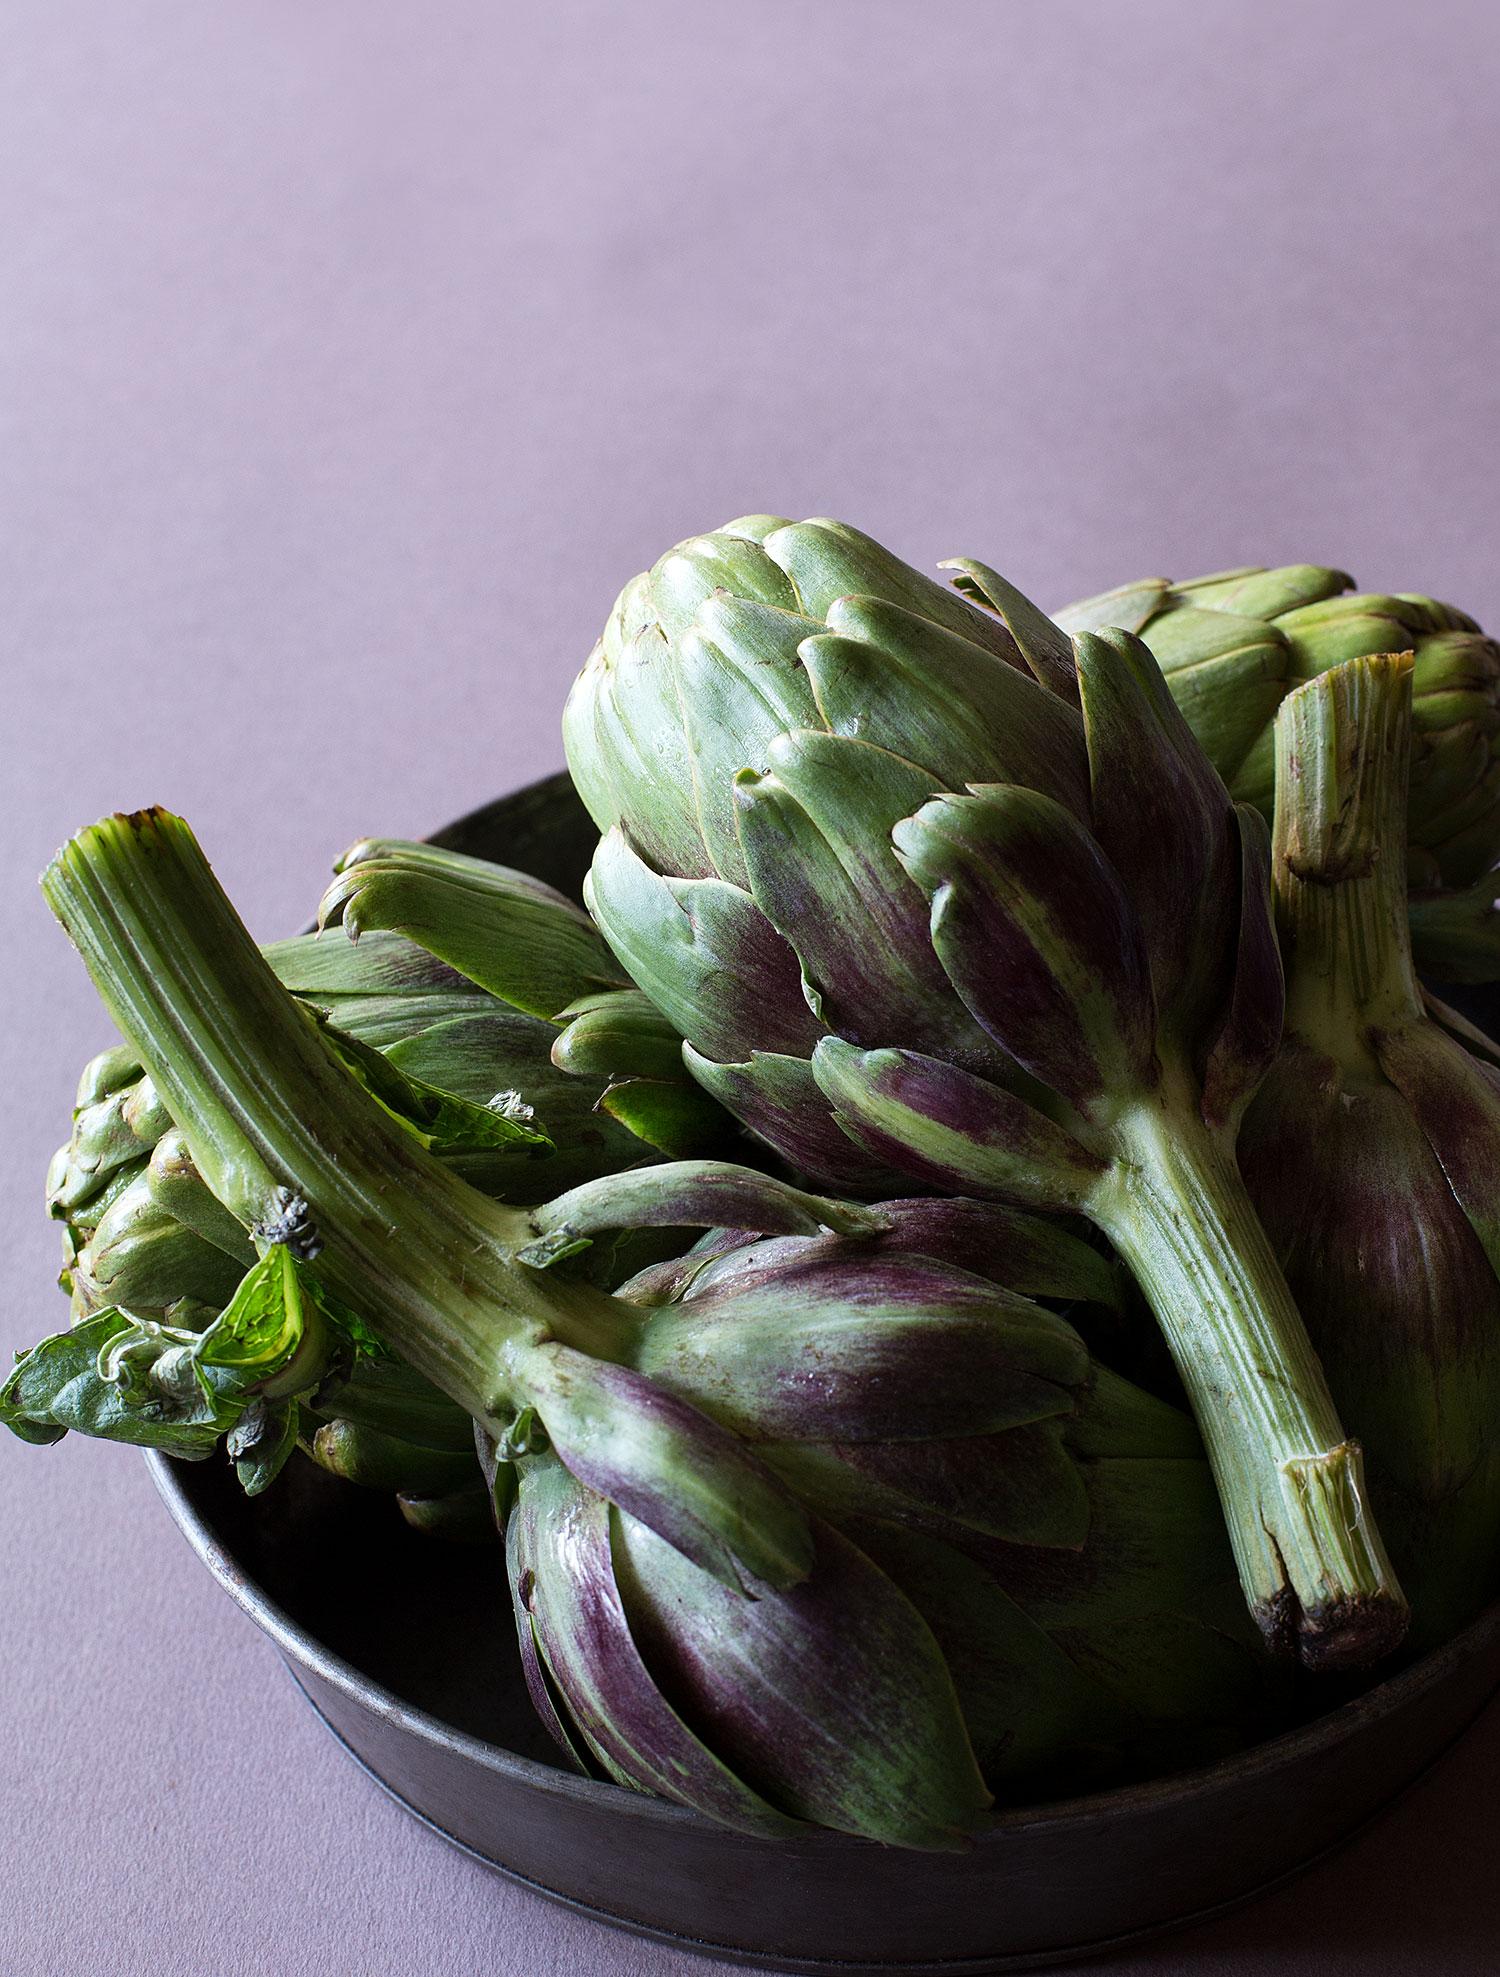 corina-landa-food-photography-fotografia-gastronomica-0179.jpg